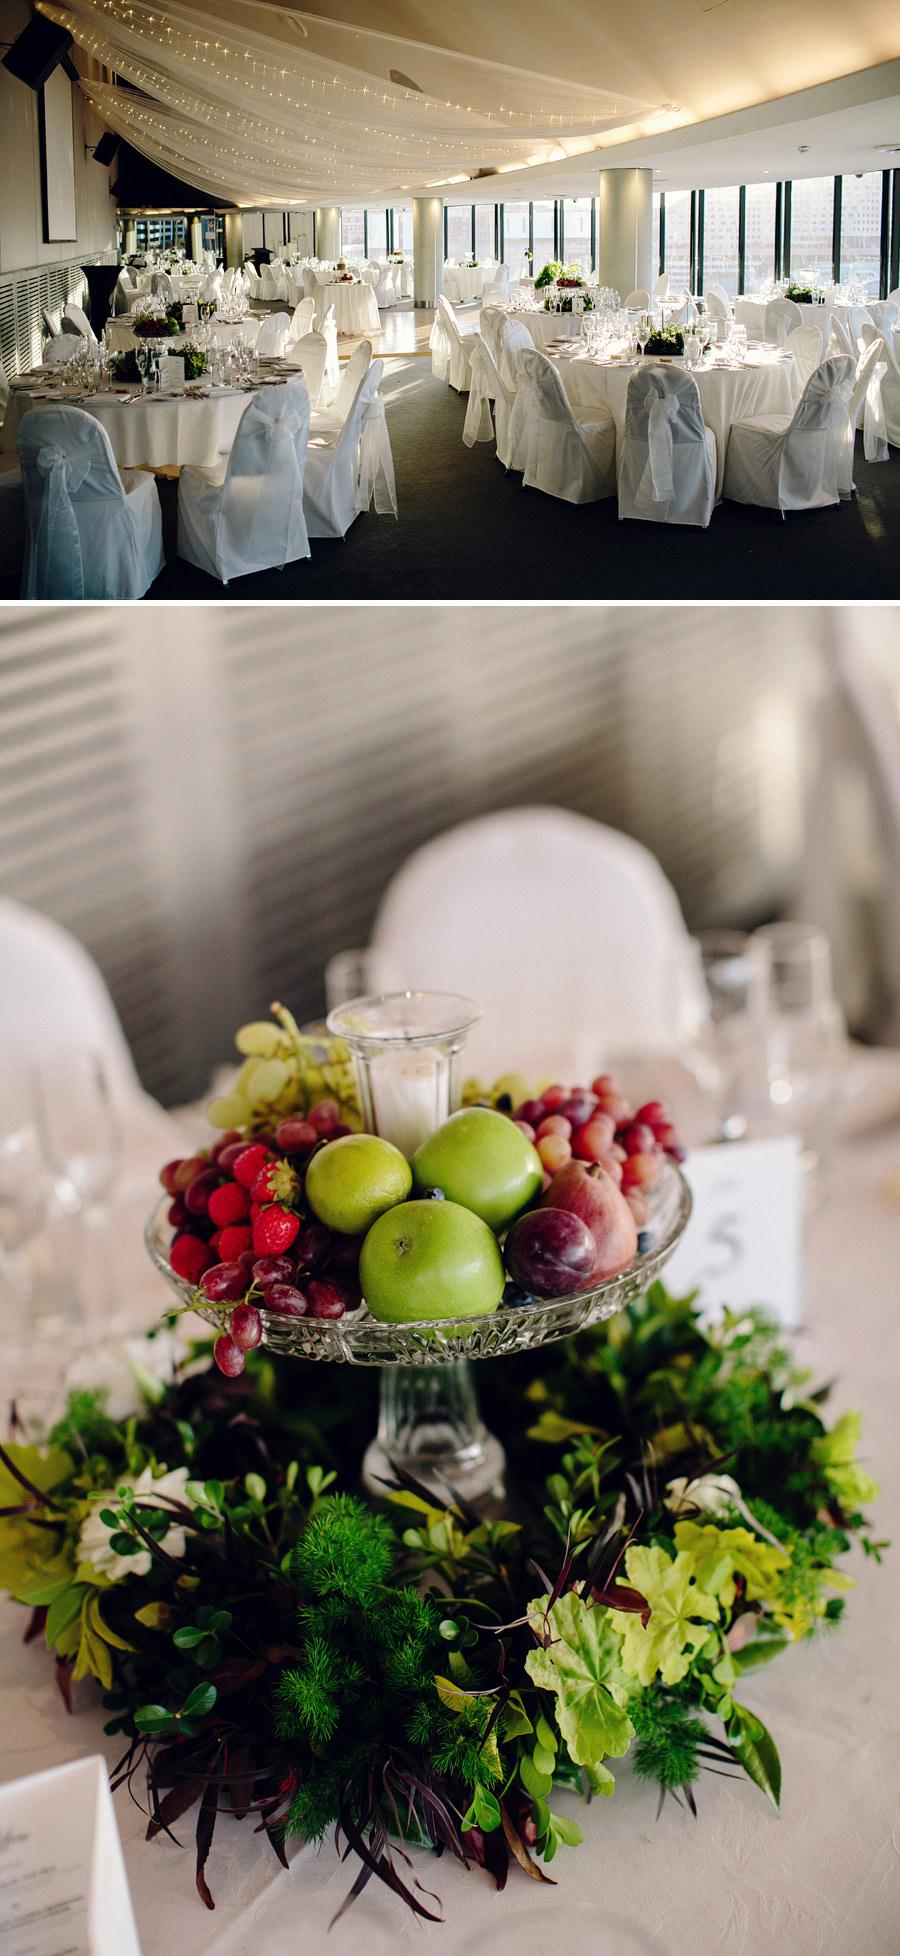 Star Room Wedding Photographer: Reception Details